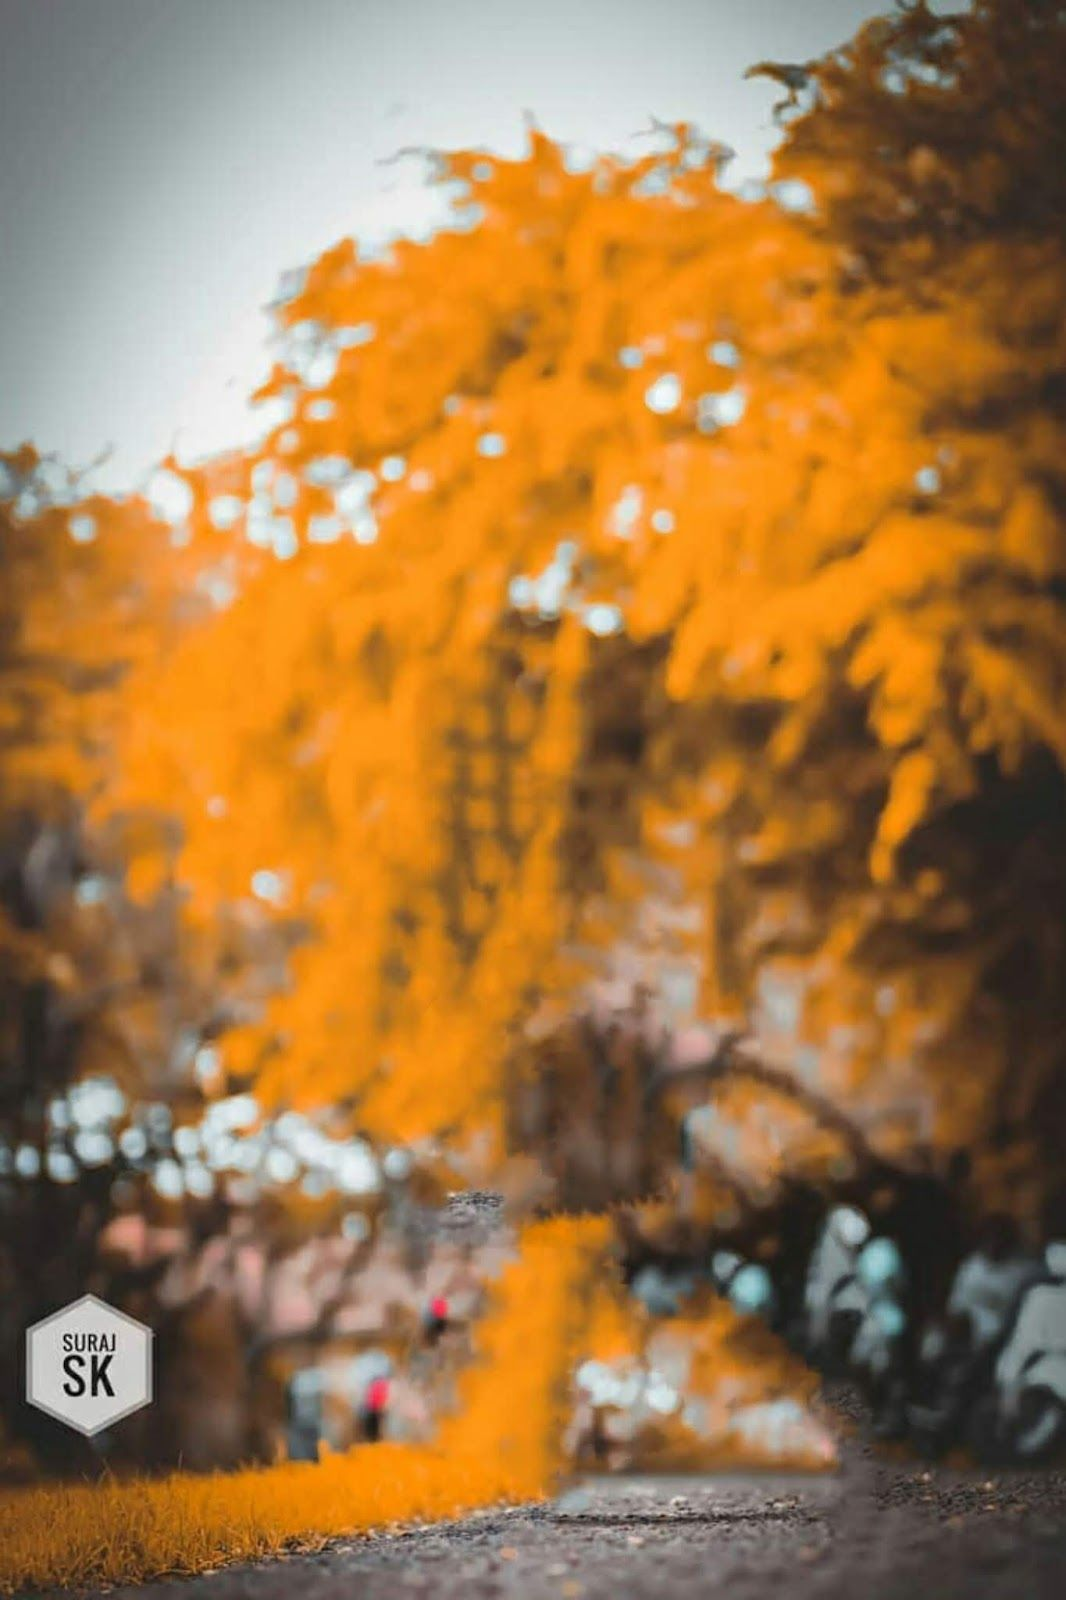 Aqua And Orange Preset Image Download 1066x1600 Wallpaper Teahub Io